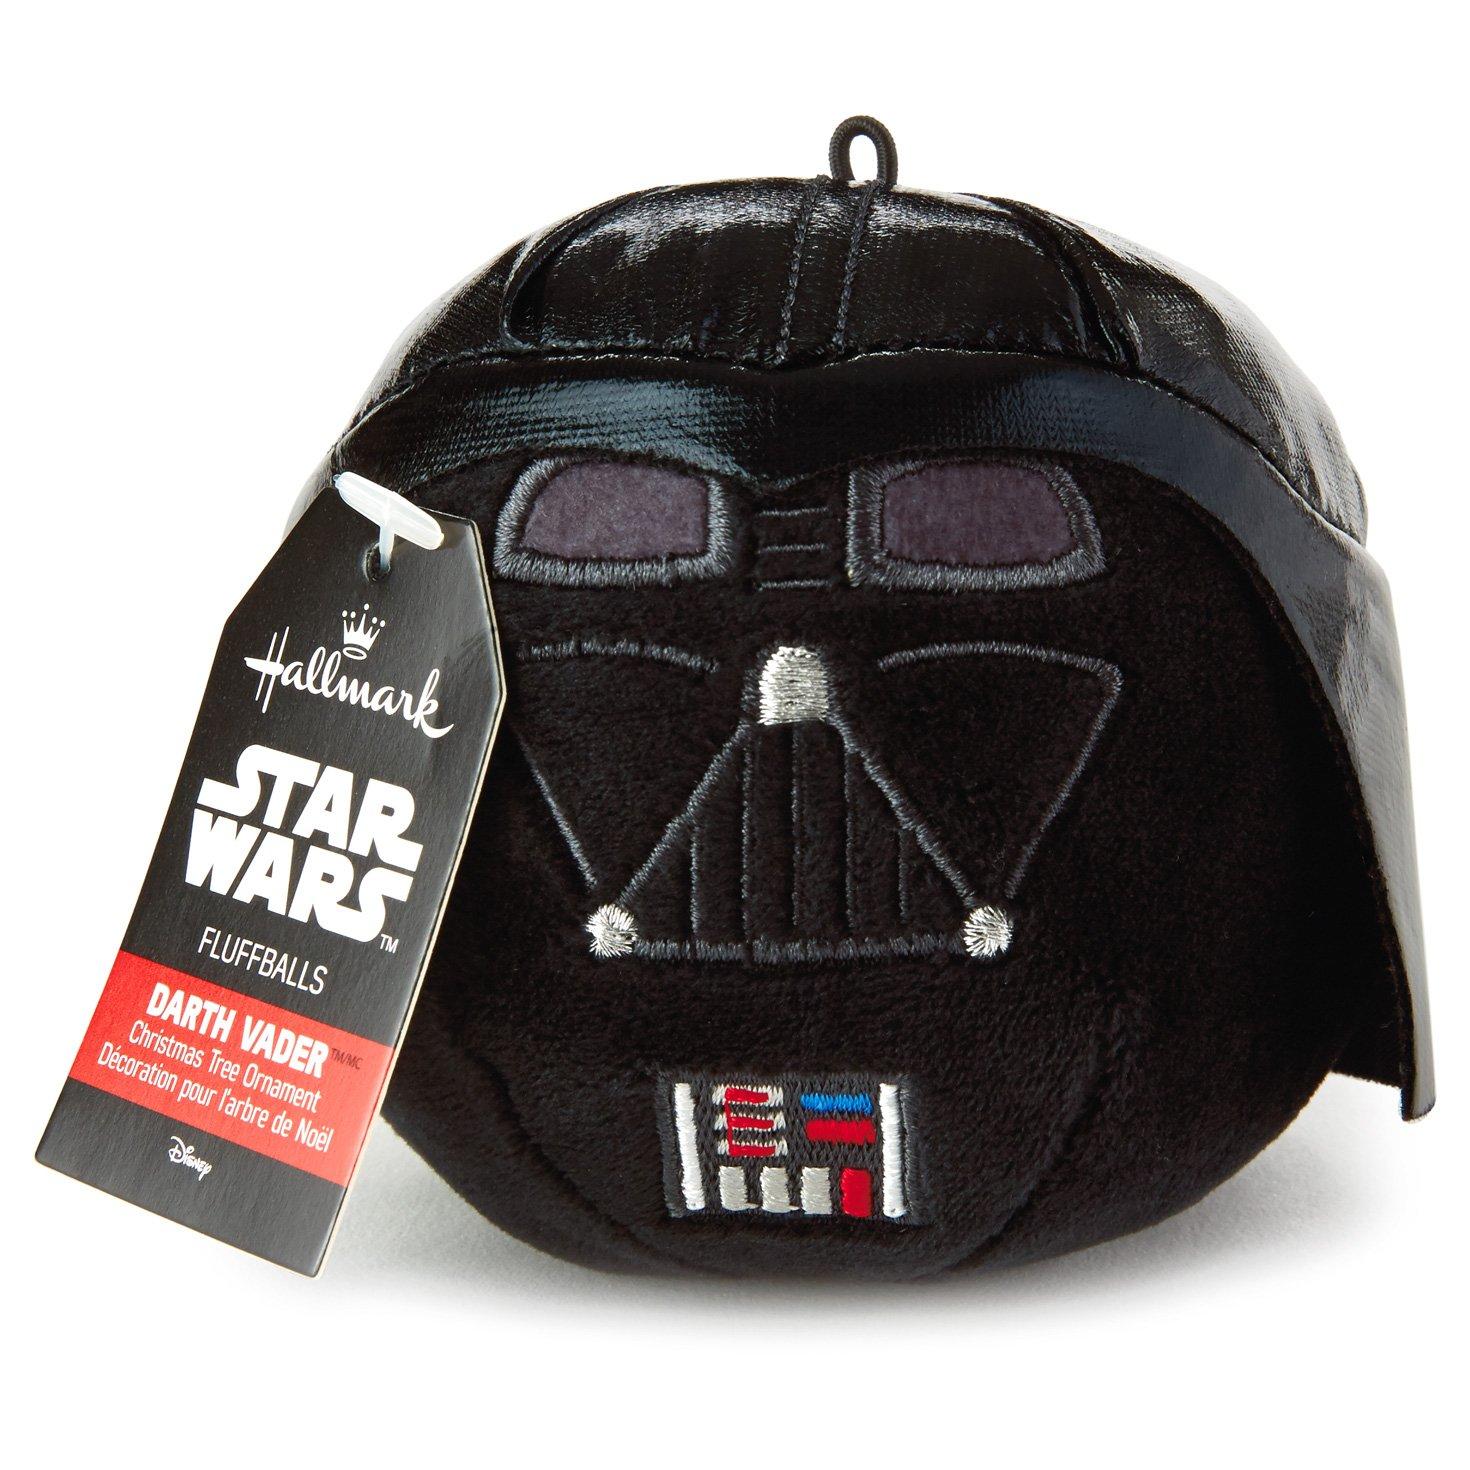 Amazon: Hallmark Star Wars Darth Vader Fluff Ball Ornament: Home &  Kitchen